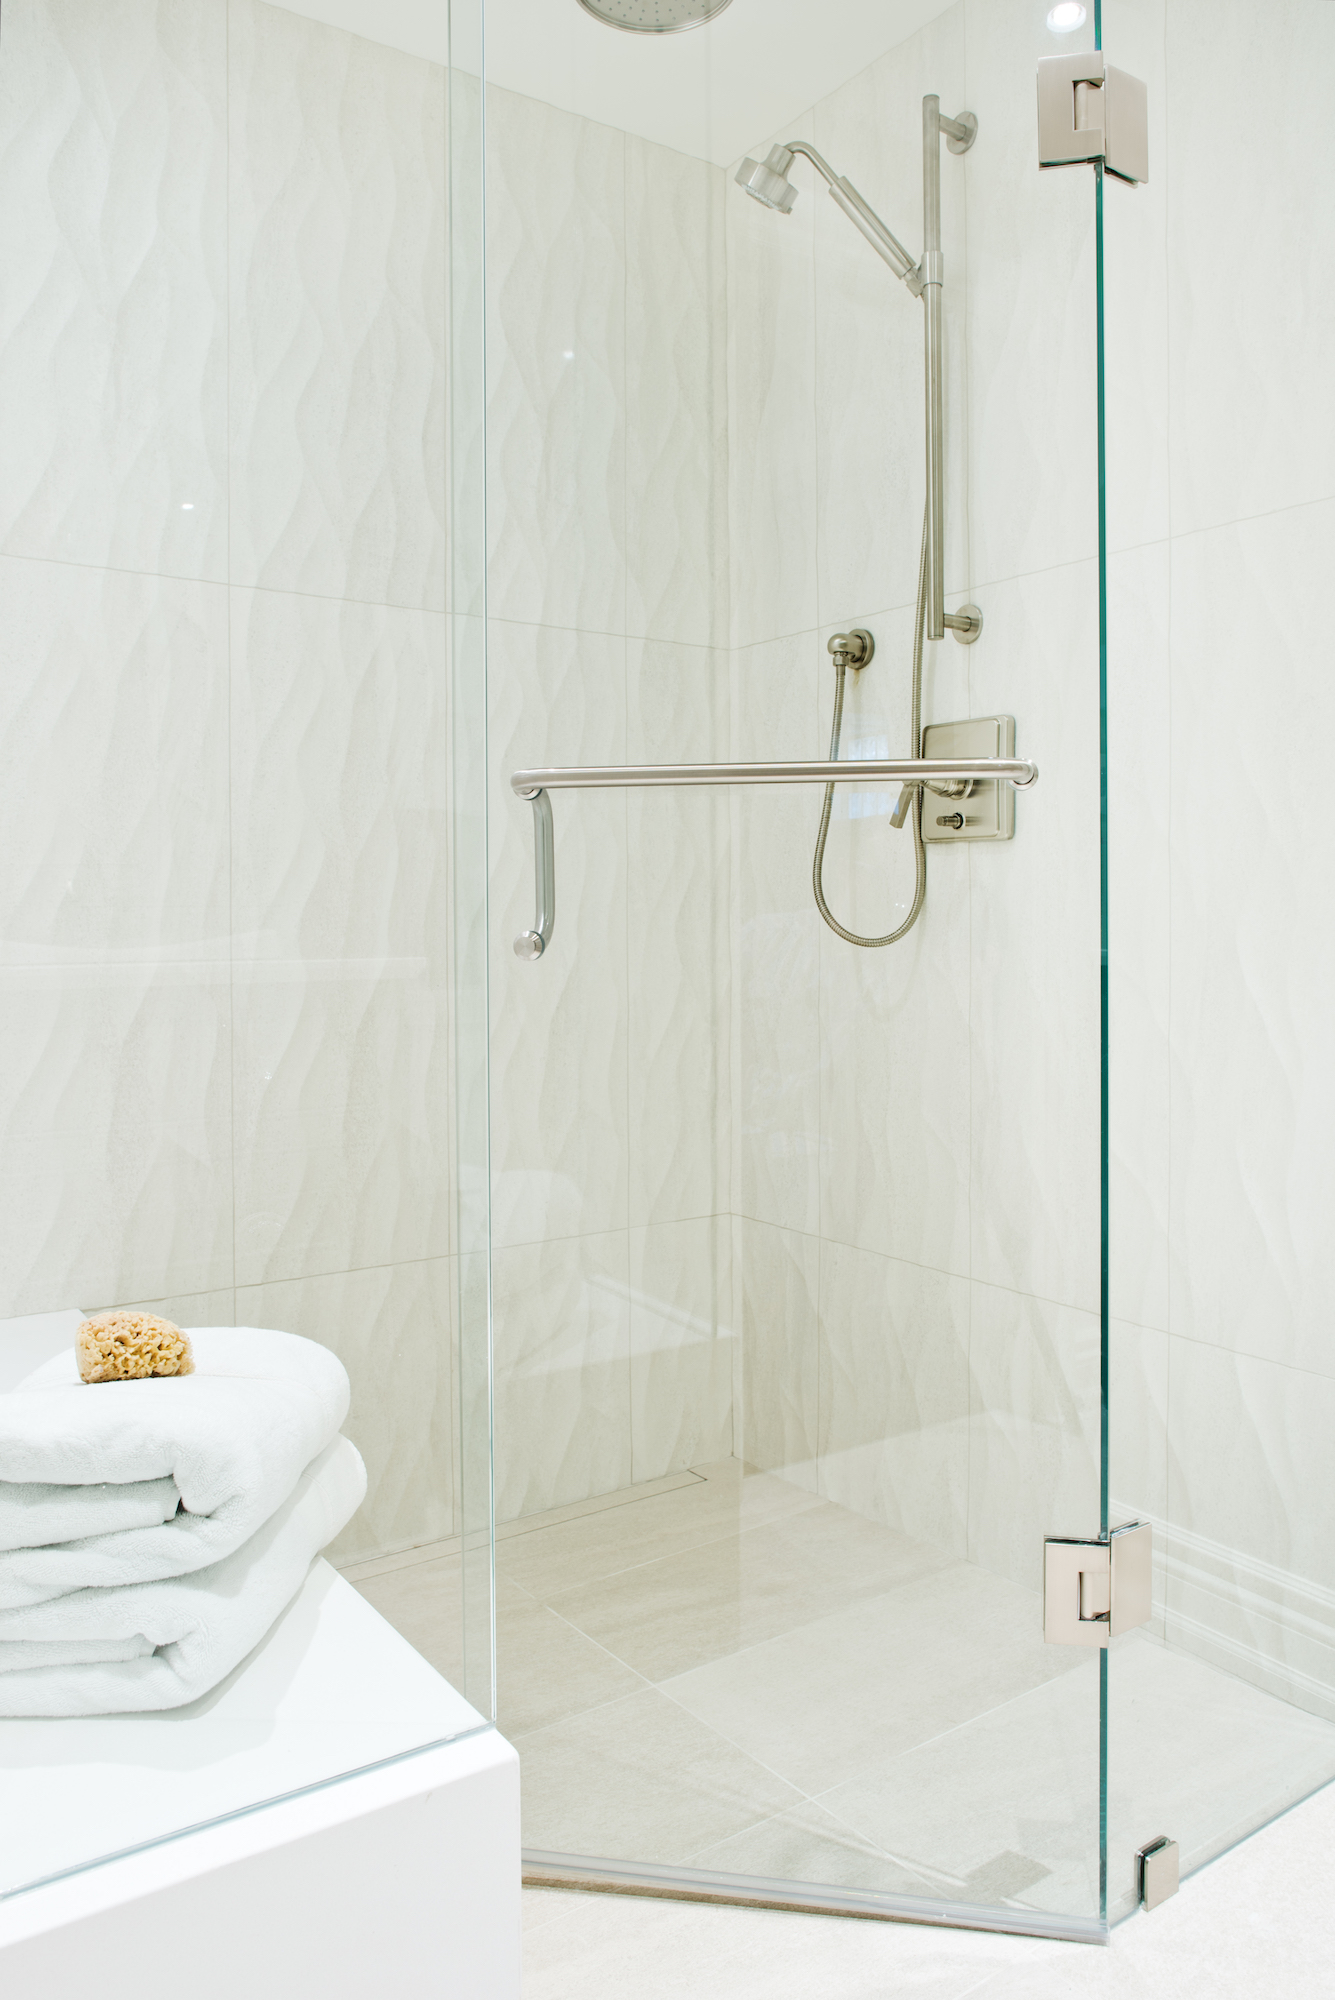 9 Pizzale Design Interior Decorating  bathroom elegant clean simple beige white texture wave tile.jpg